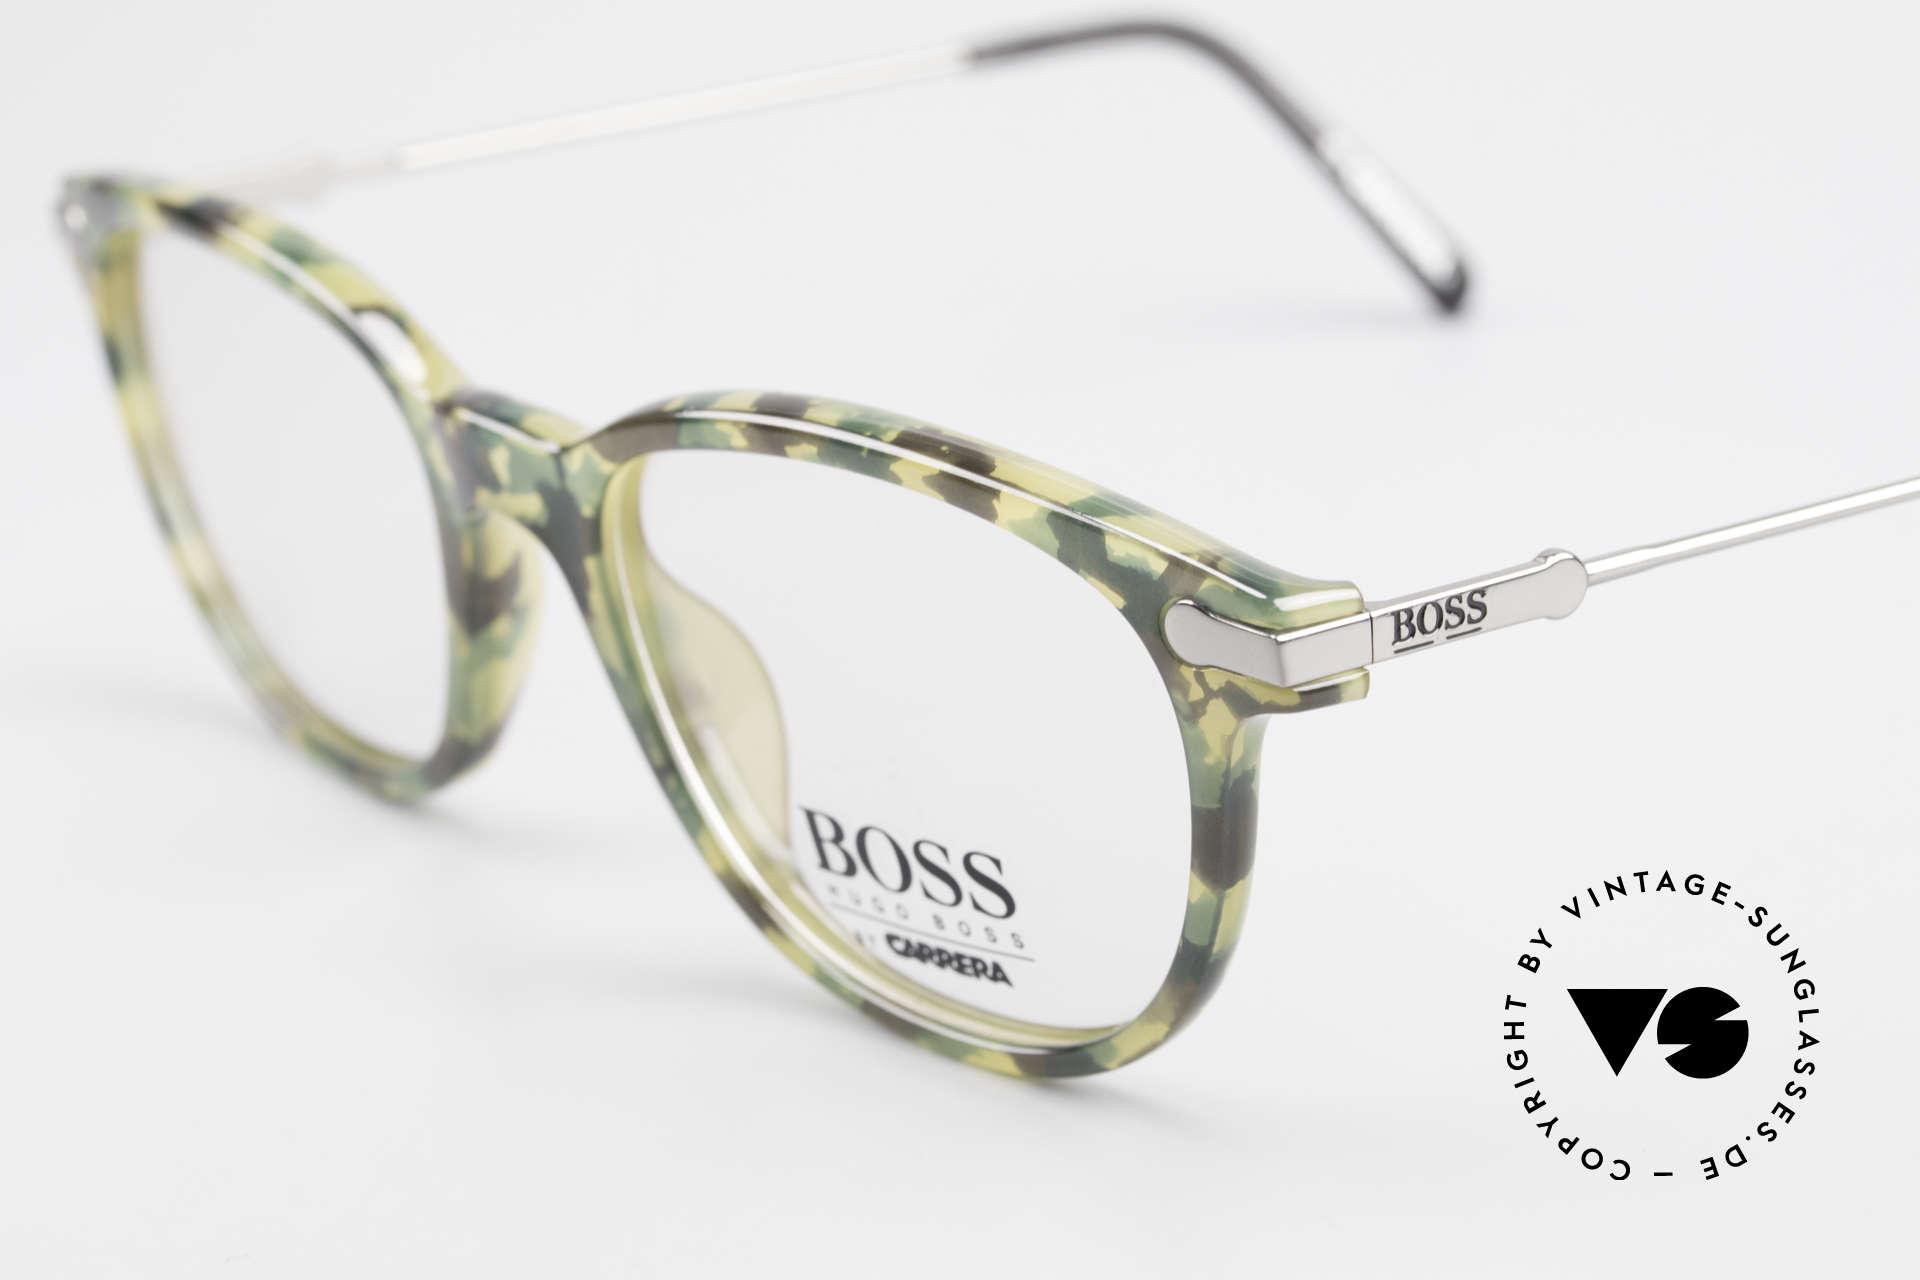 BOSS 5115 Camouflage Vintage Eyeglasses, unworn (like all our rare vintage BOSS eyeglasses), Made for Men